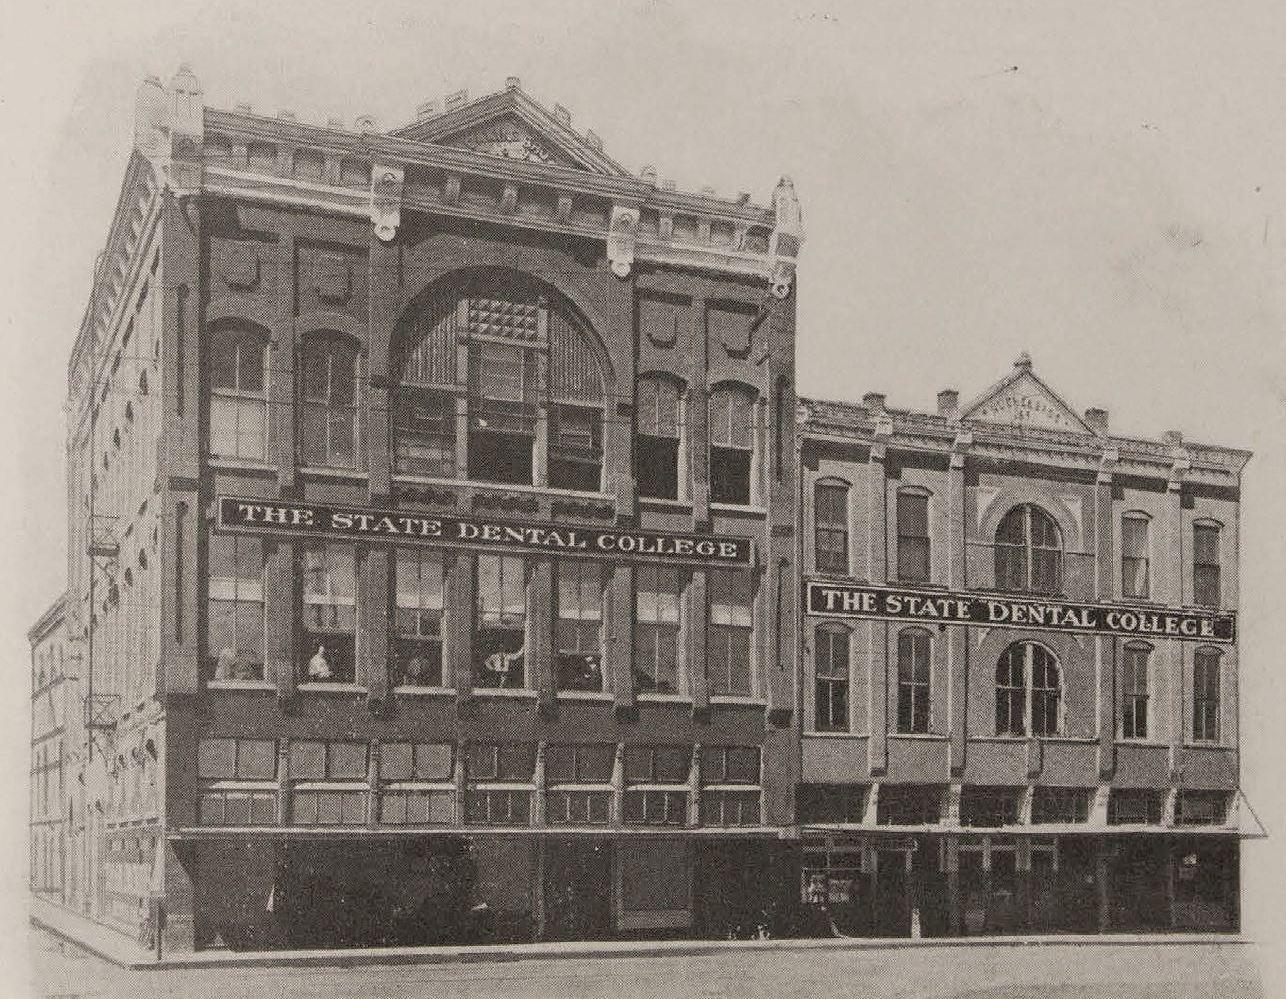 dallas-educational-center_state-dental-college_ca-1916_degolyer-library_smu_photo